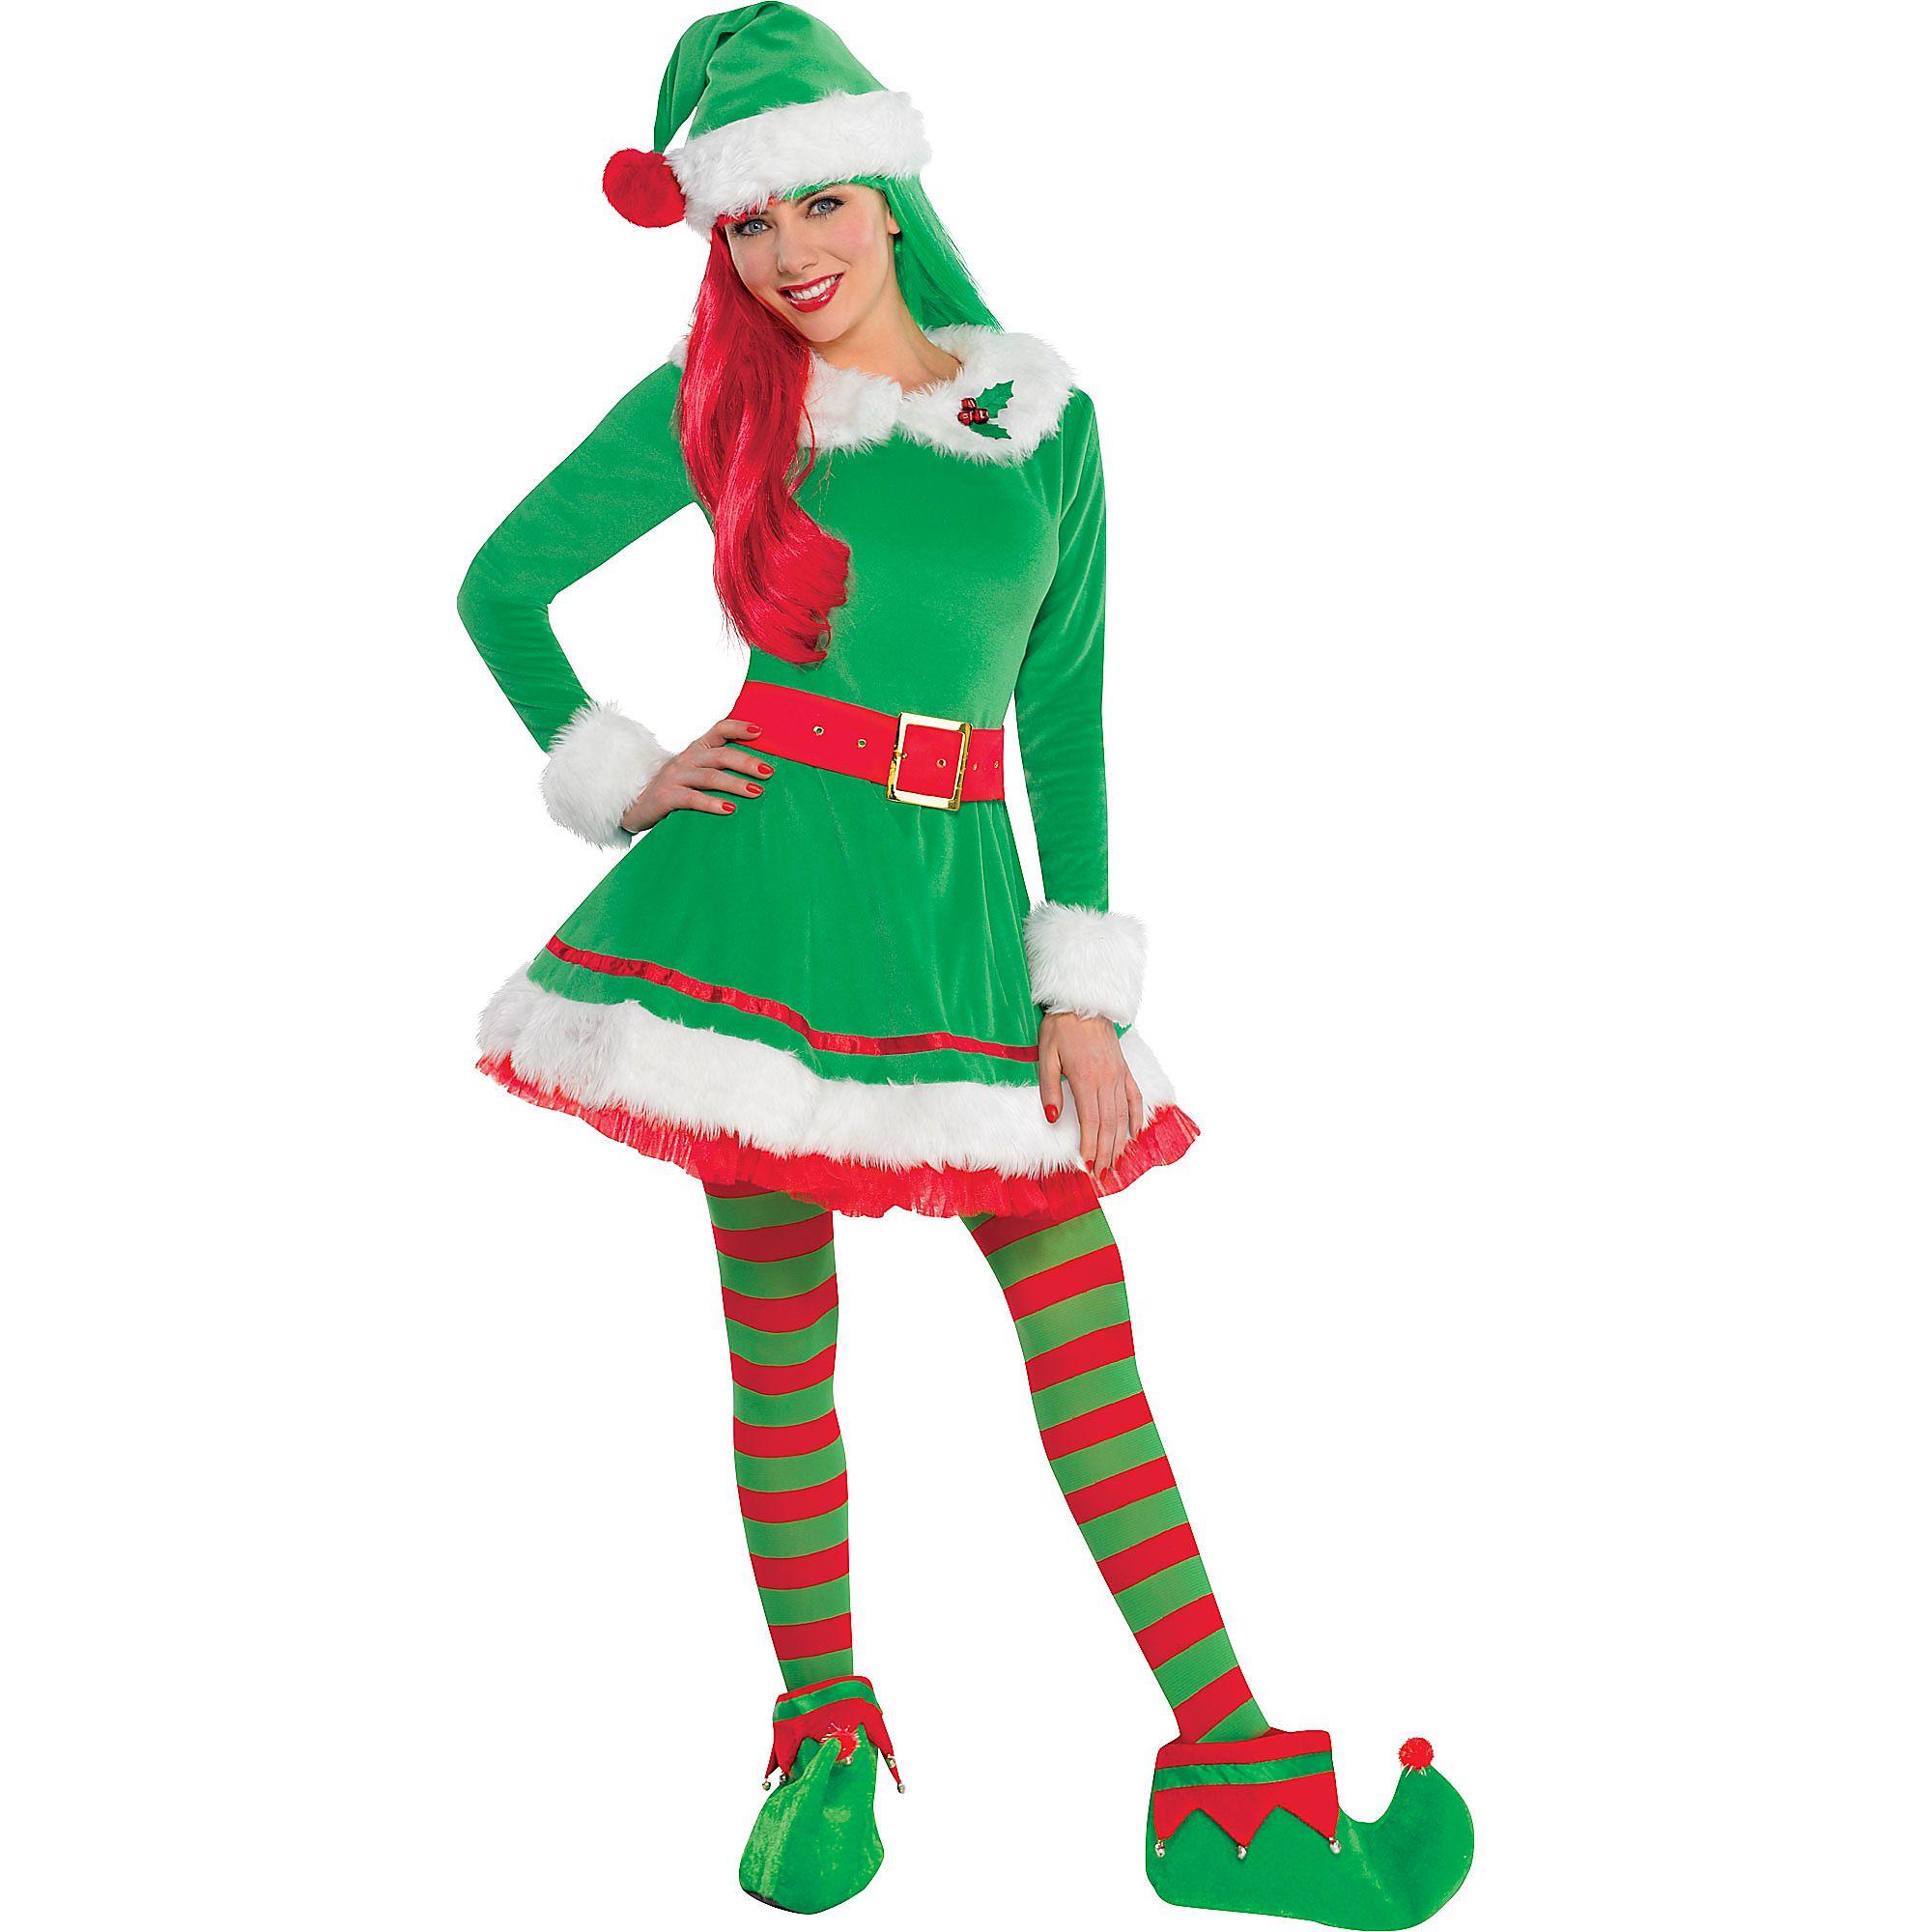 75258c66d1 Green Elf Costume for Women, Christmas Costume, Medium, with ...